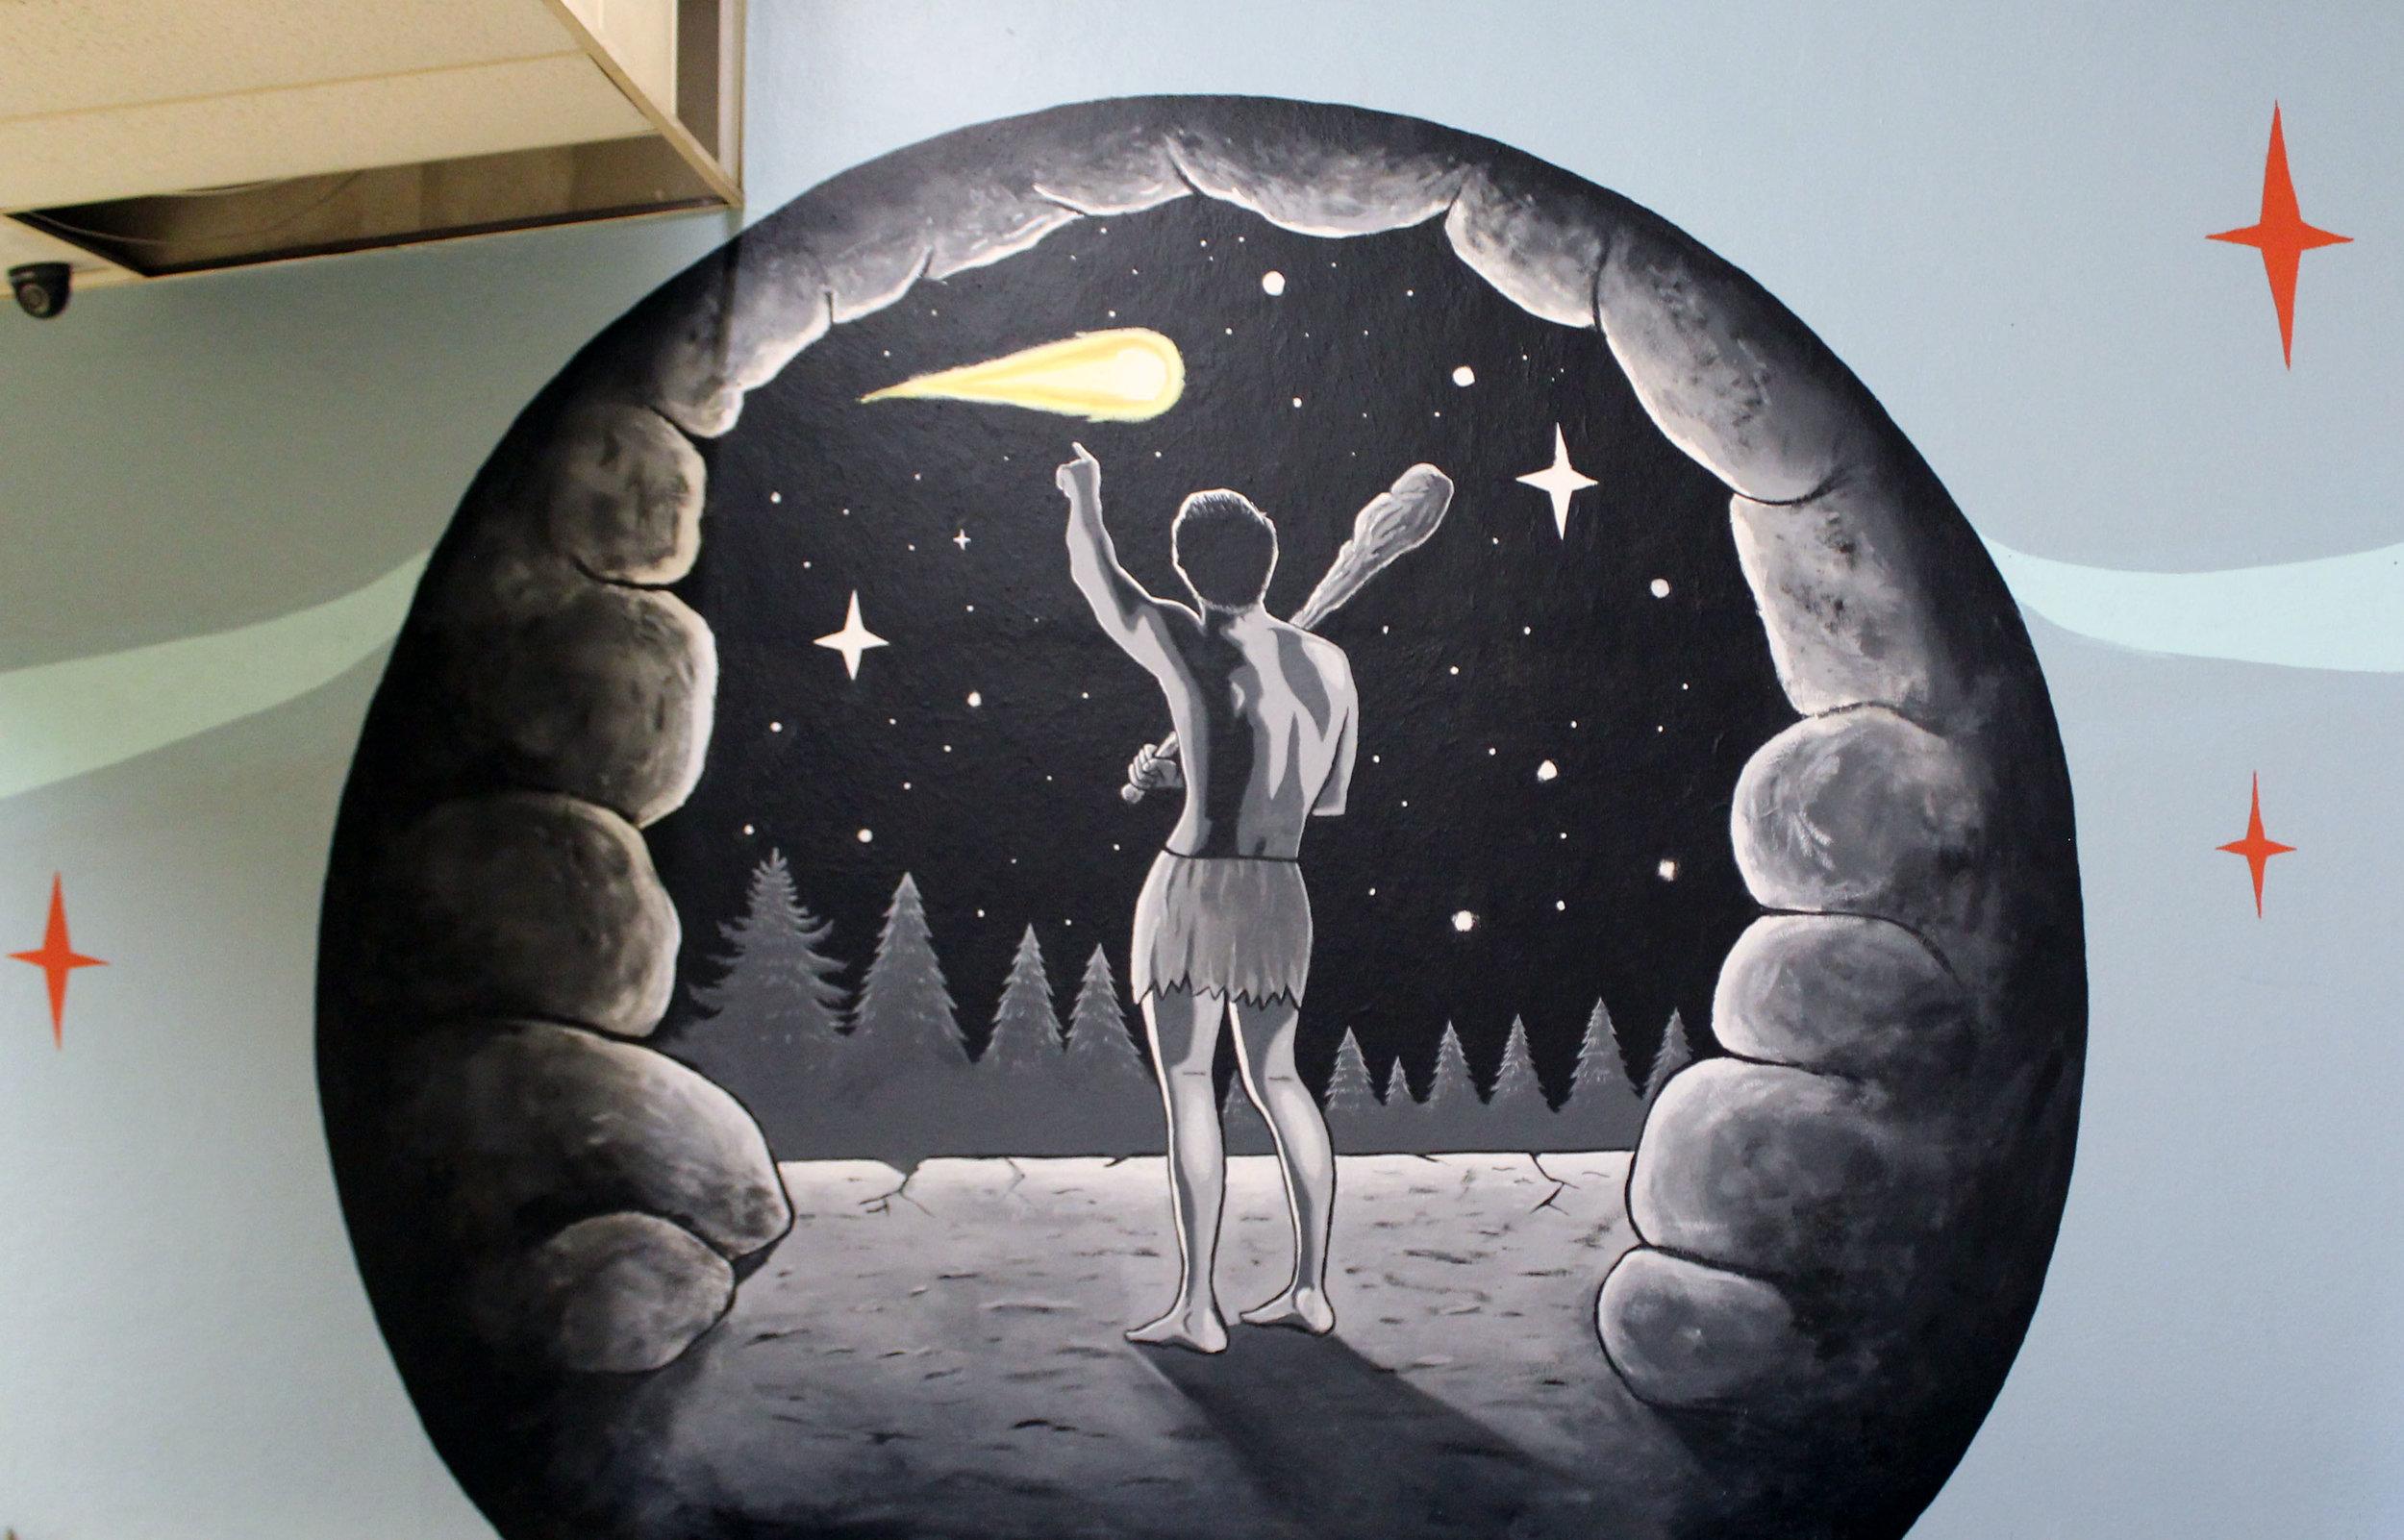 240 BC caveman the comet.jpg